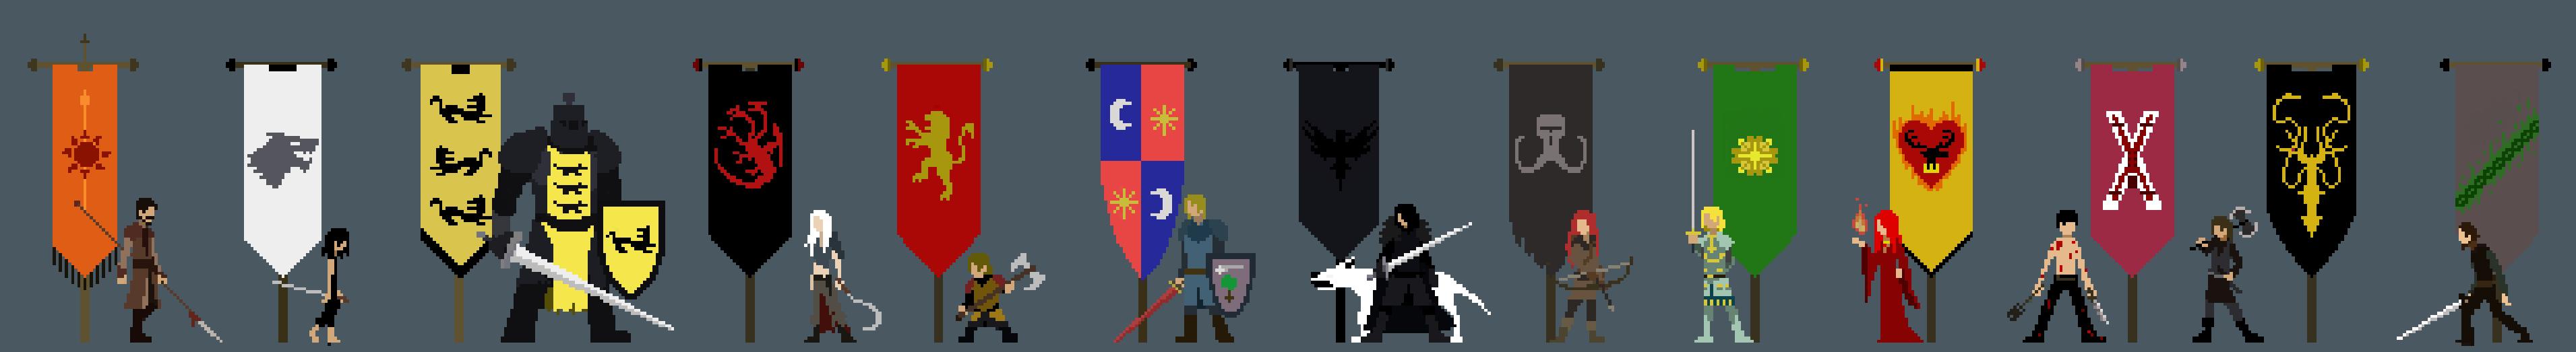 Bits of Thrones *updated